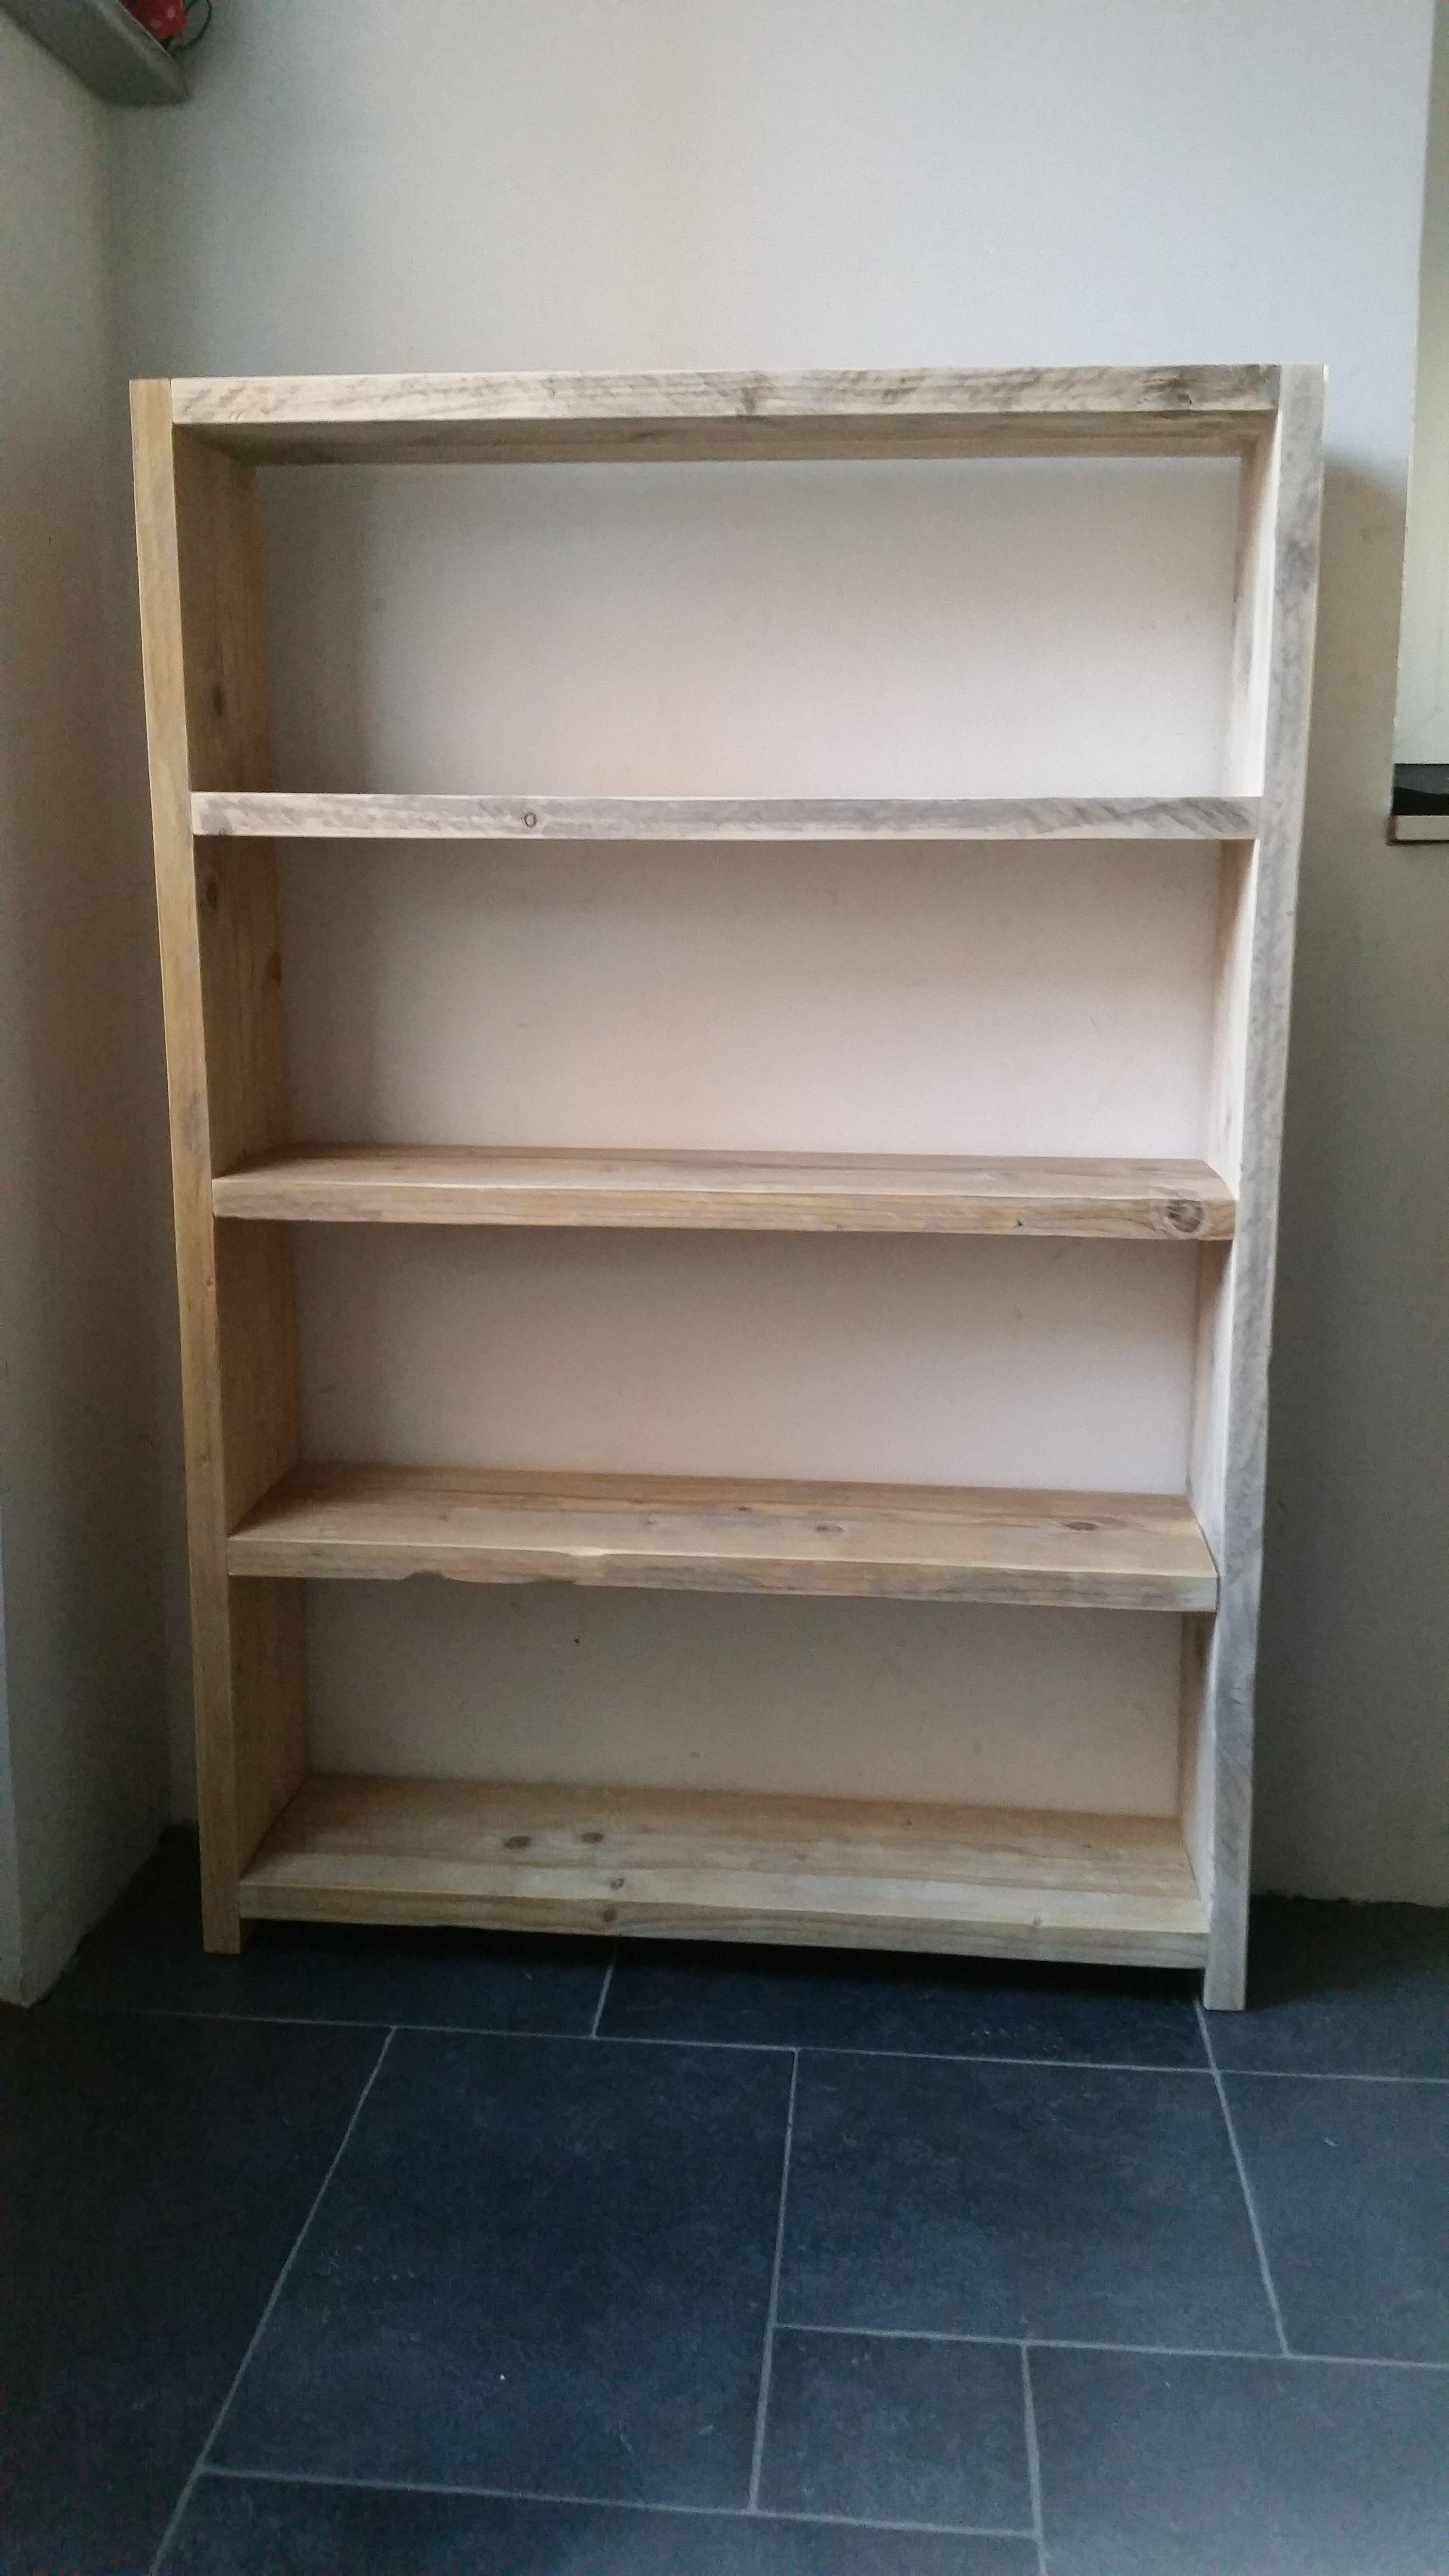 Schoenkast Kast Gemaakt Uit Gebruikt Steigerhout Shoe Cabinet Cabinet Made